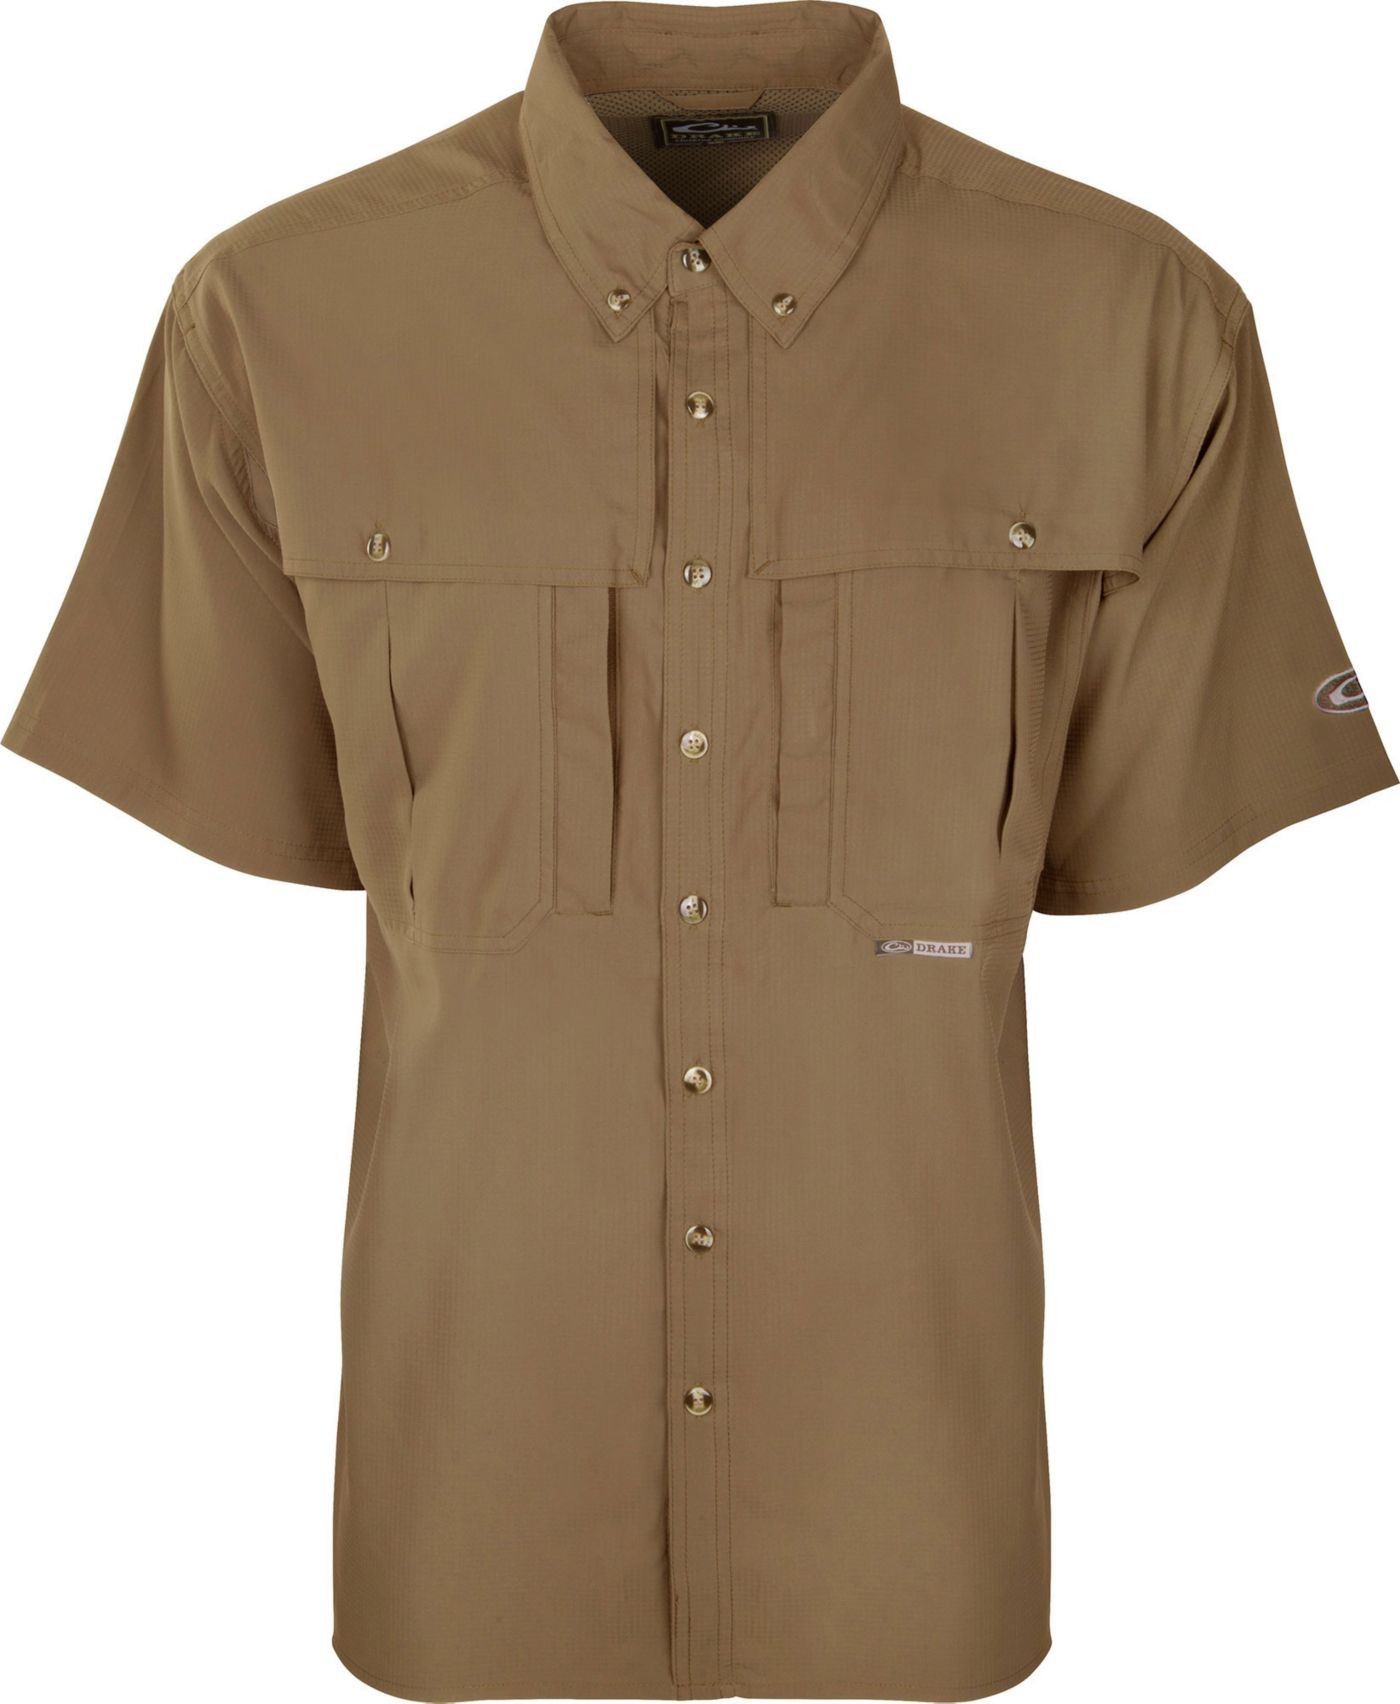 Drake Waterfowl Men's Flyweight Wingshooters Short Sleeve Shirt